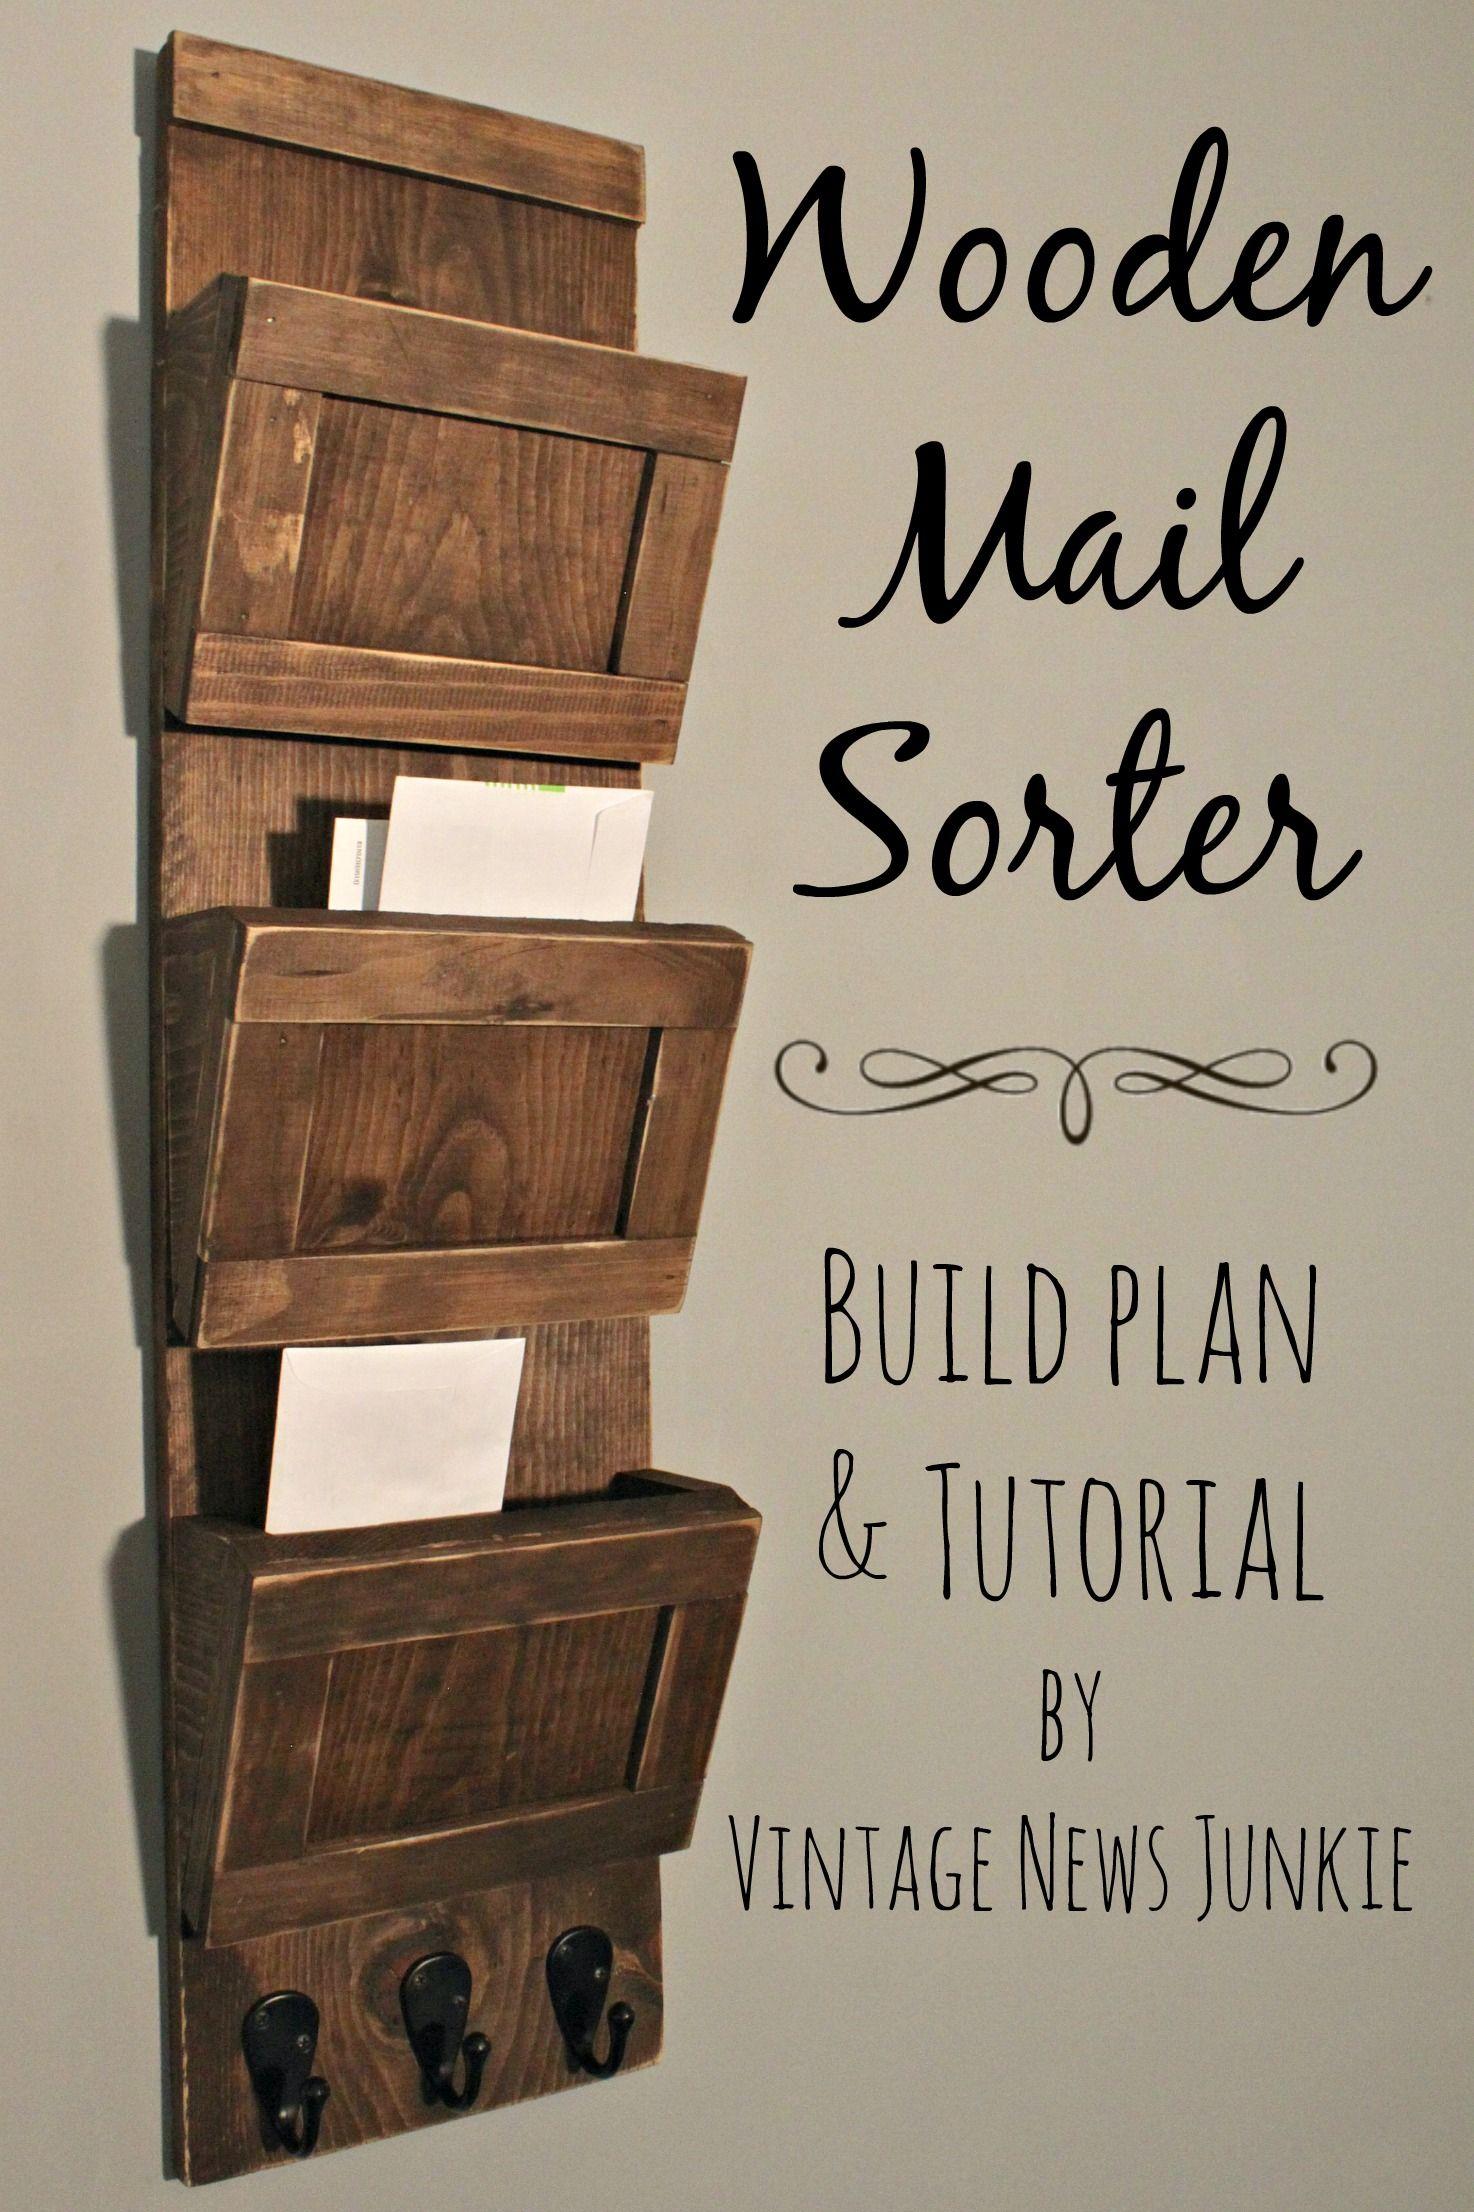 Get Organized Diy Wood Mail Sorter Plans And Tutorial Rustic House Wood Diy Wooden Diy